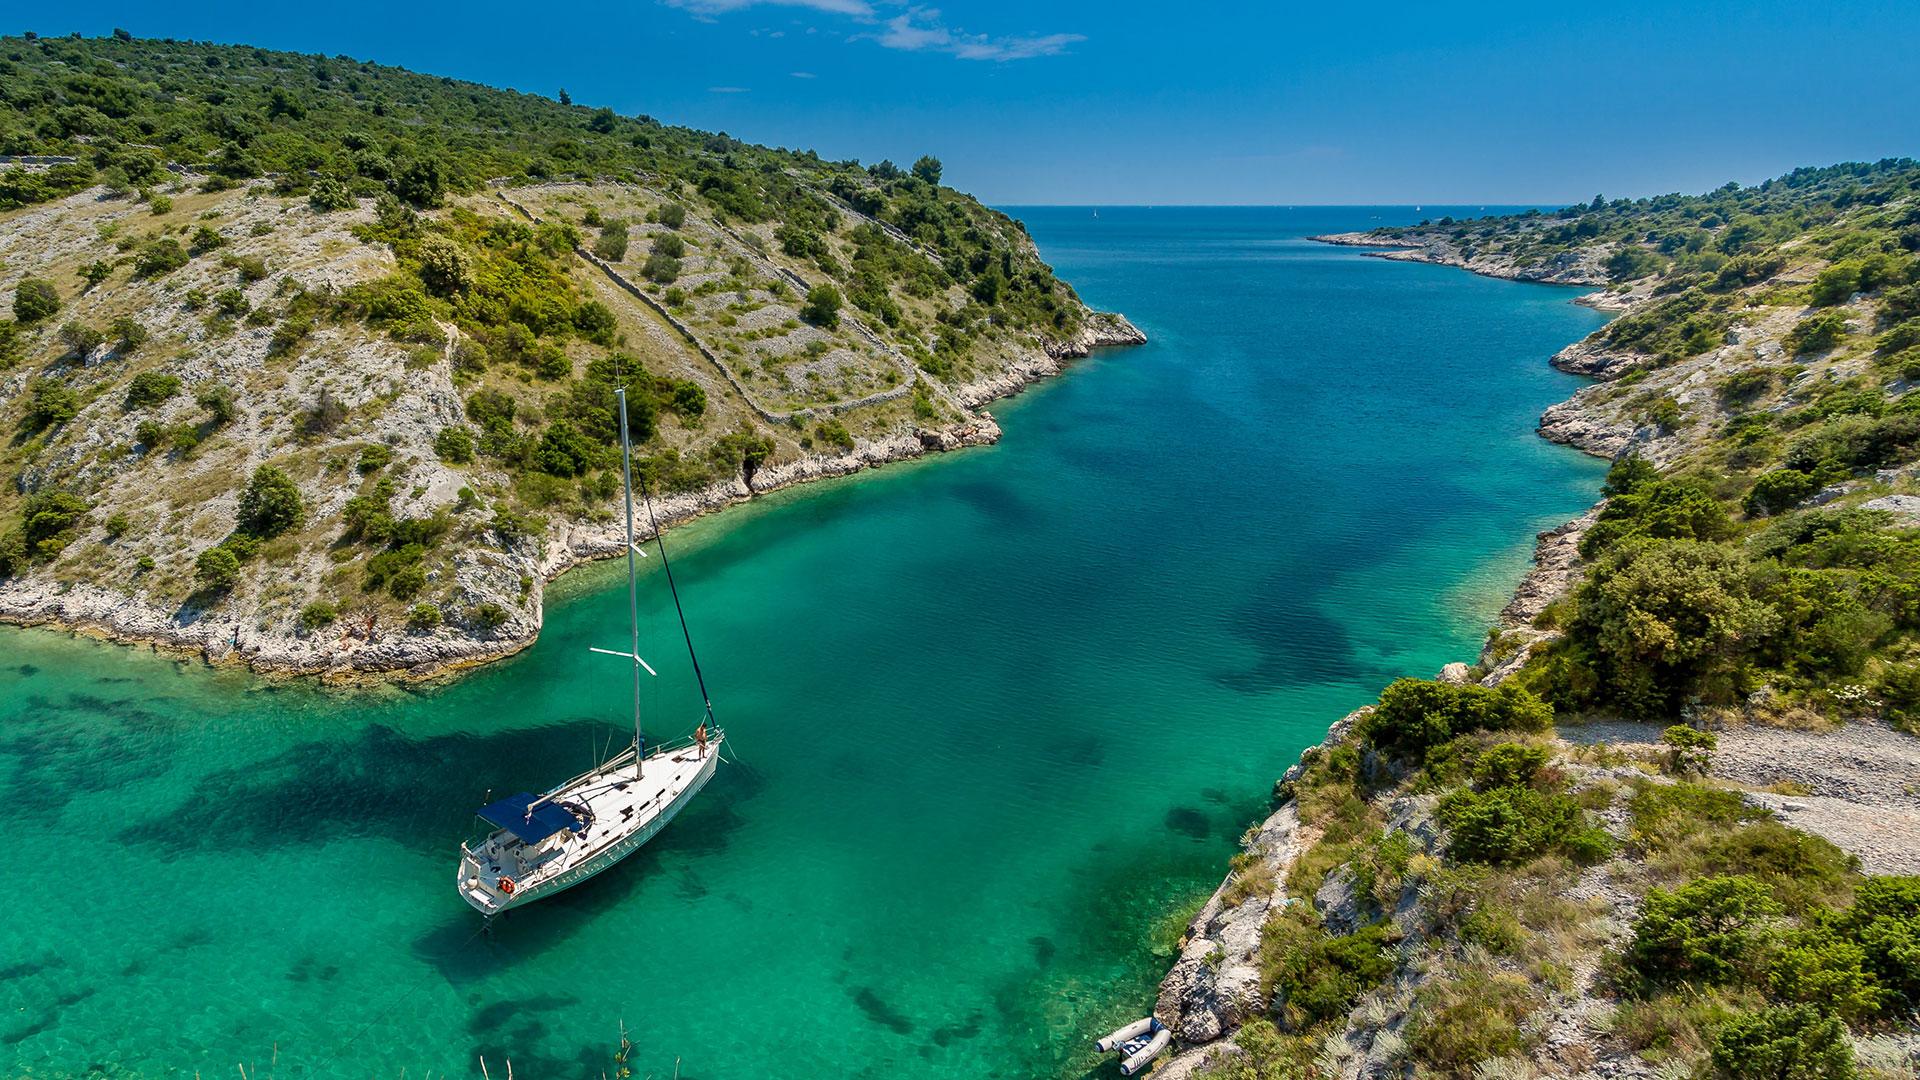 Kroatien. Luxusreise